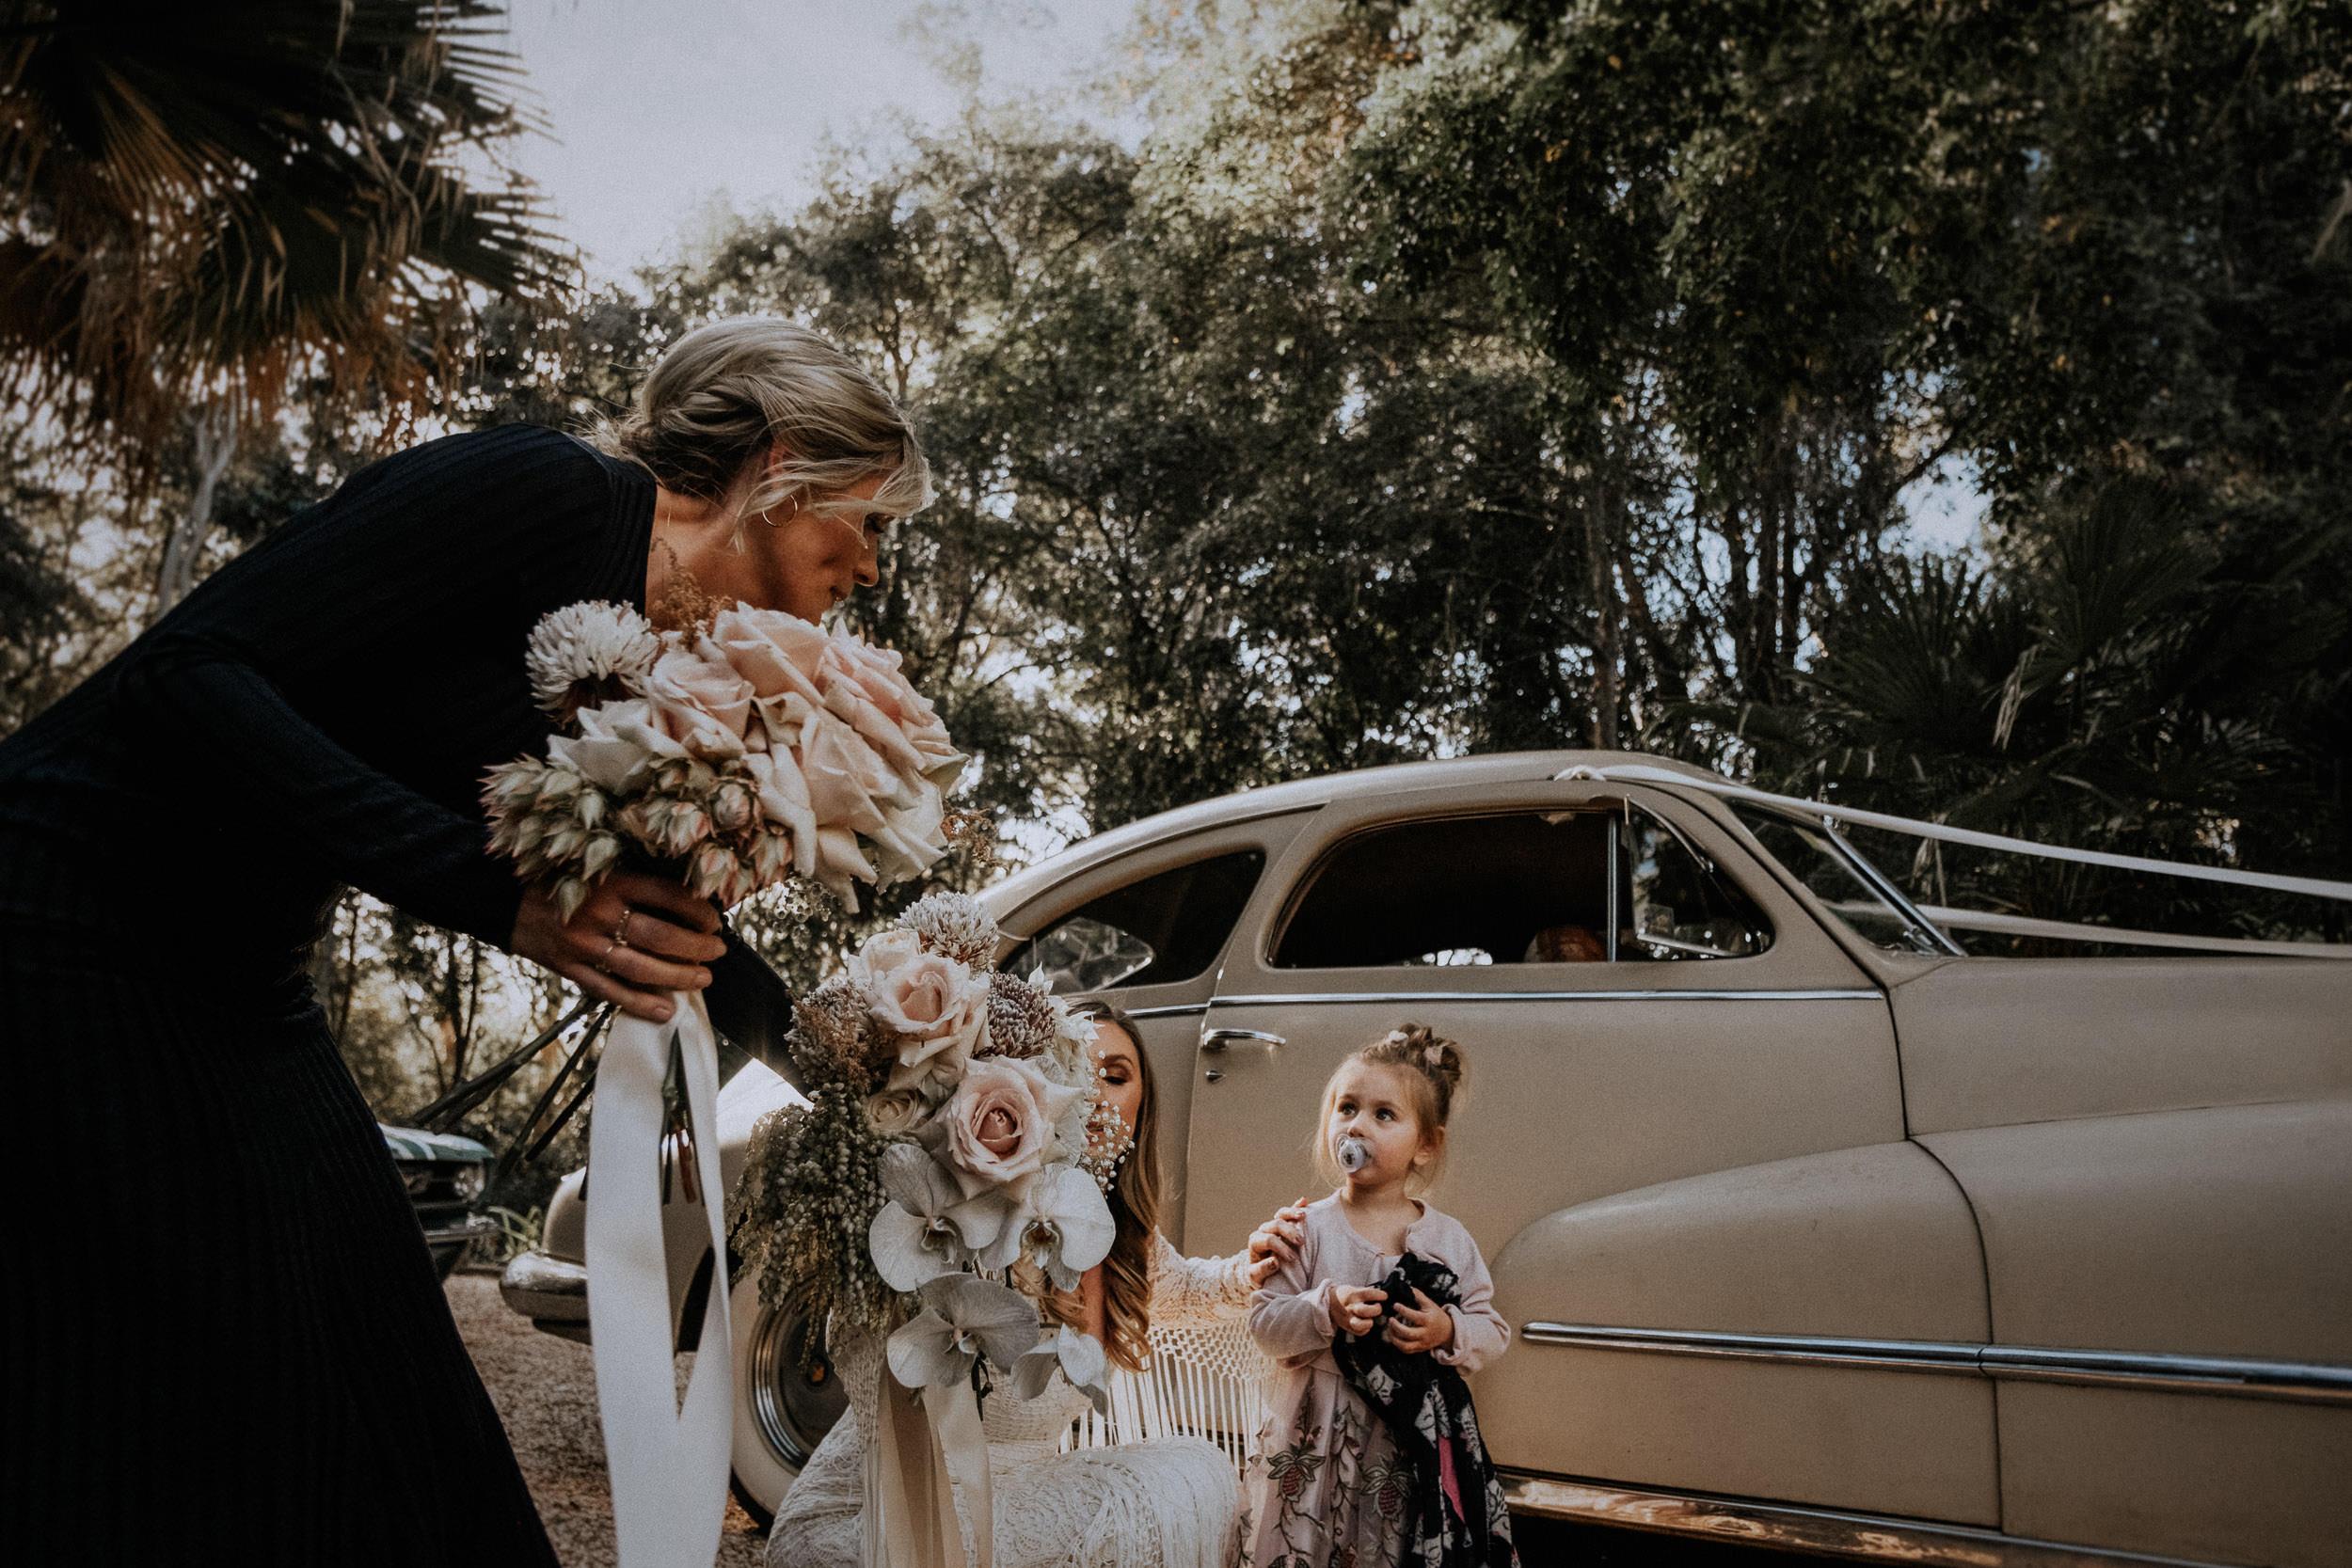 S&A Elopement - Kings & Thieves - Shred 'Til Dead - Central Coast Beach Forest Wedding - 150.jpg